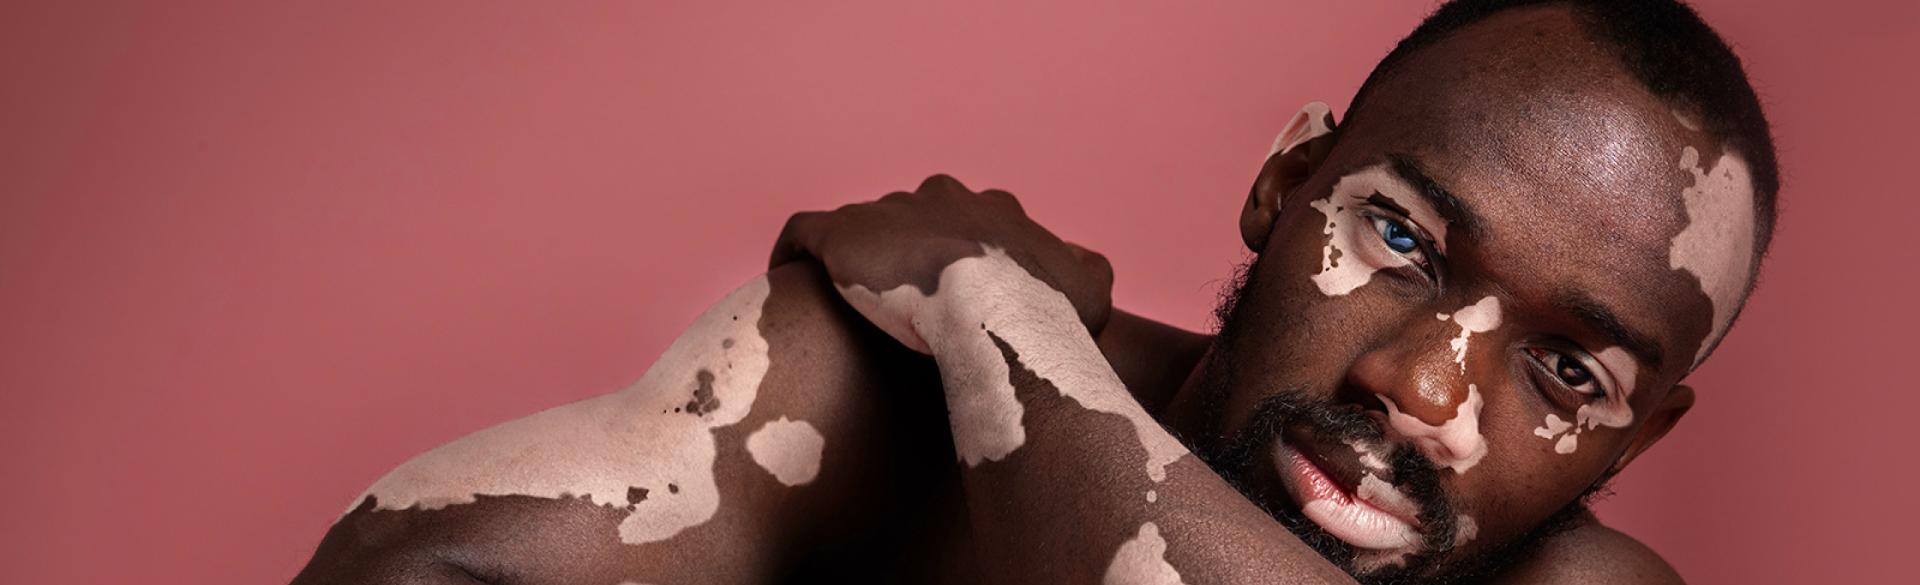 Researchers Making Progress On Causes Of Vitiligo